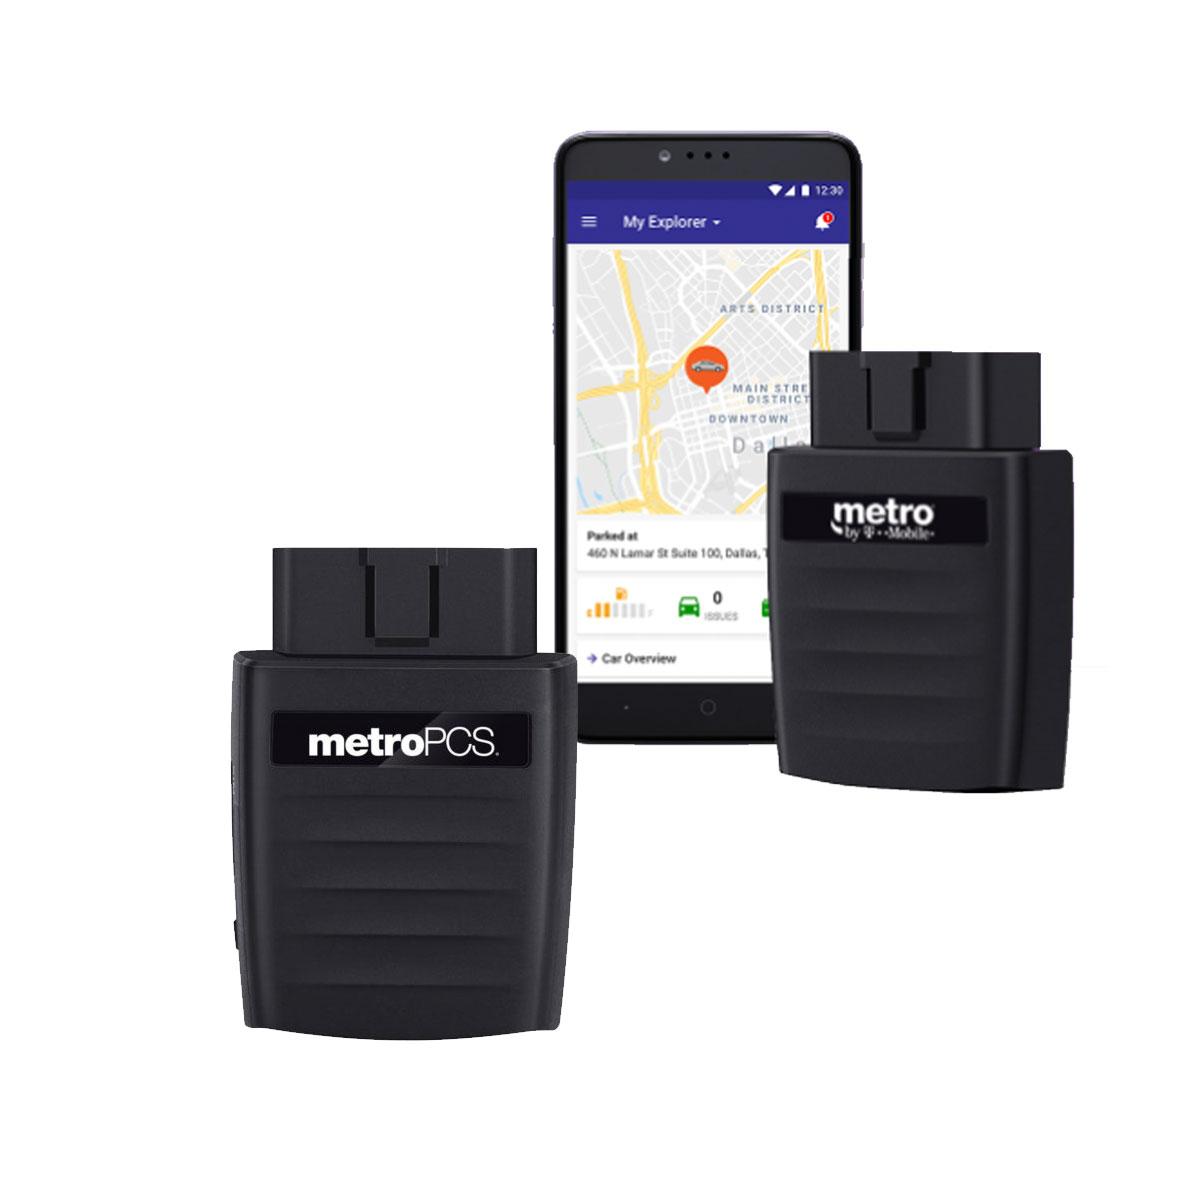 Details about MetroPcs MetroSMART Ride Car WiFi Hotspot GPS Tracking  Roadside